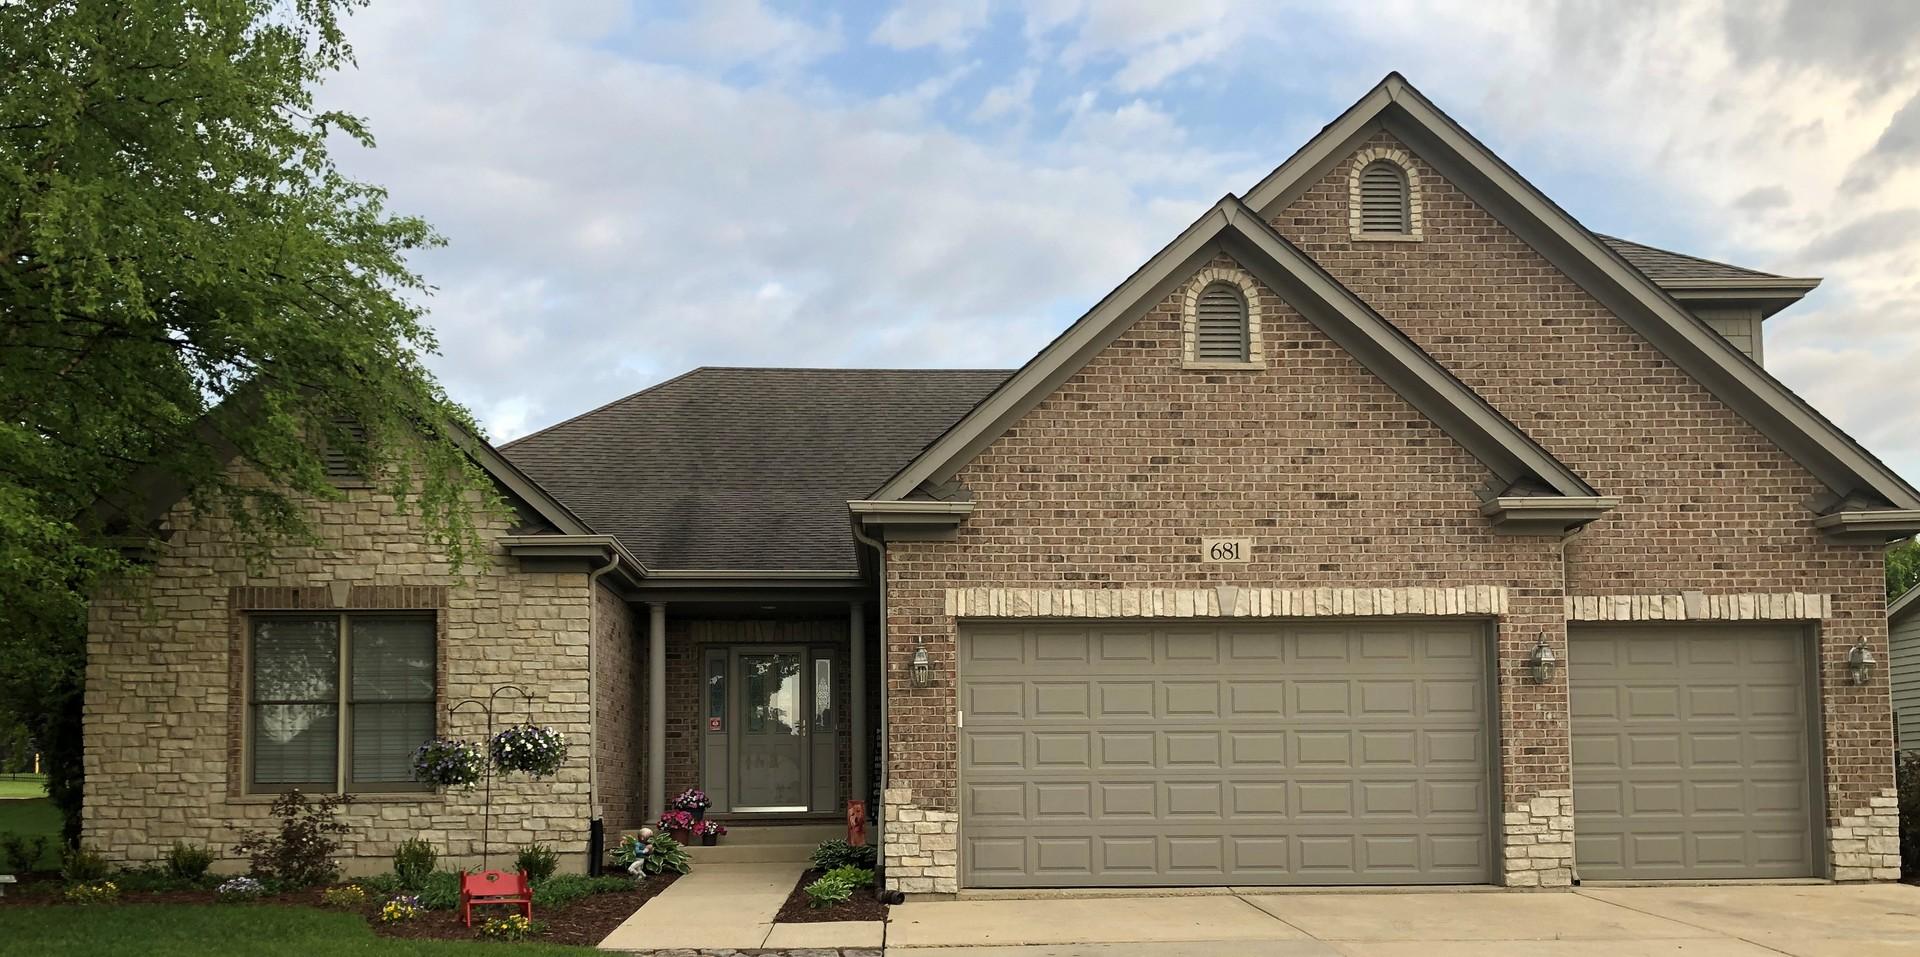 681  Greenfield,  Sugar Grove, Illinois